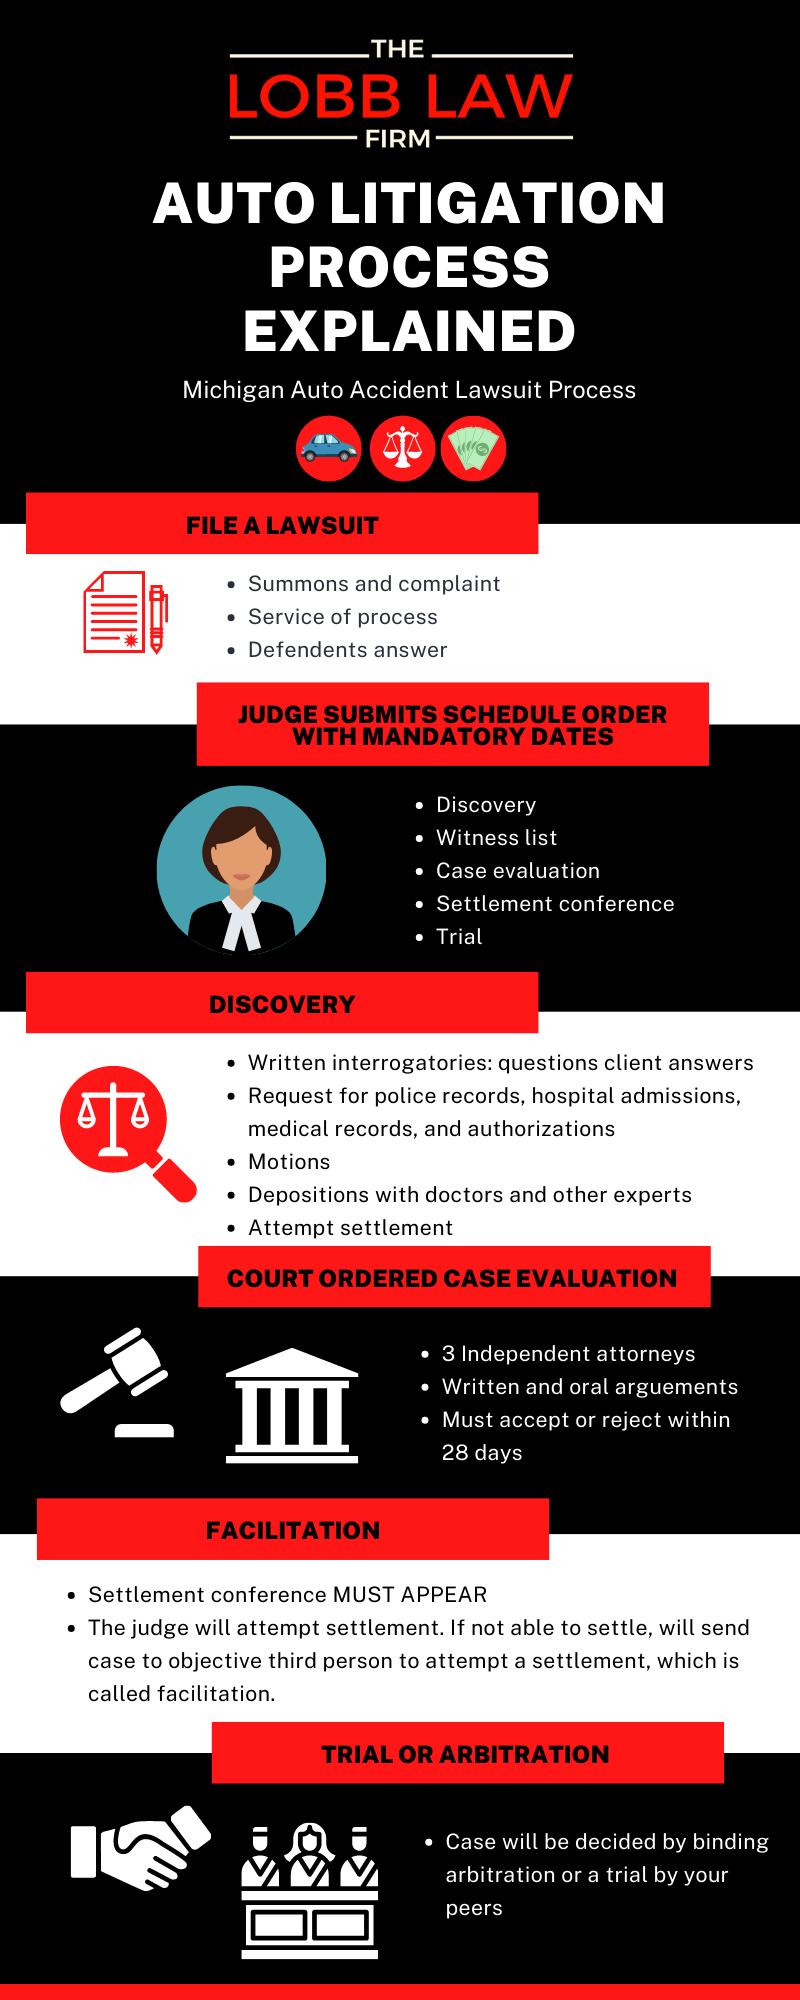 Auto Litigation Process Infographic